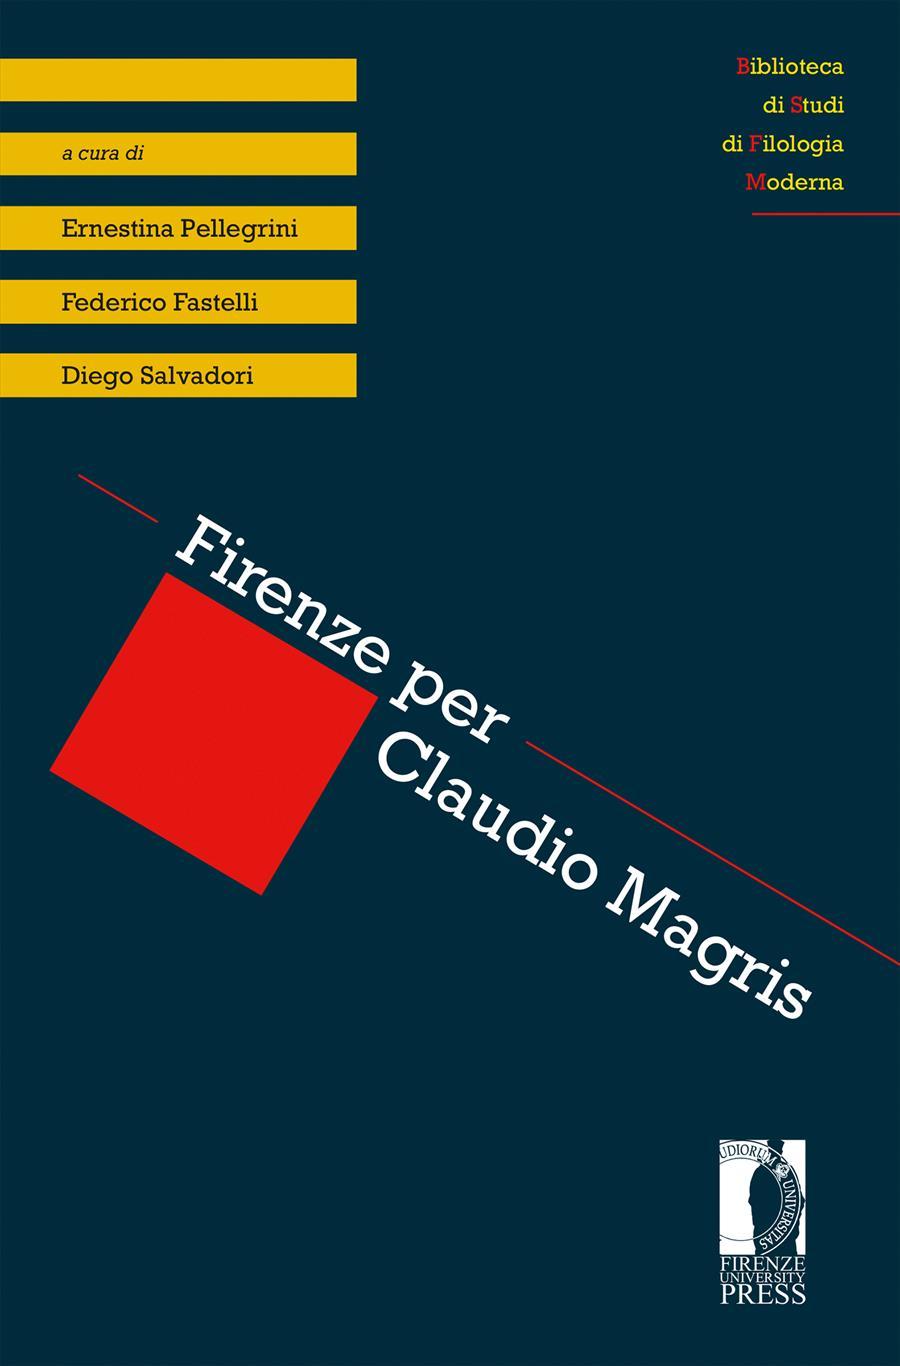 Firenze per Claudio Magris